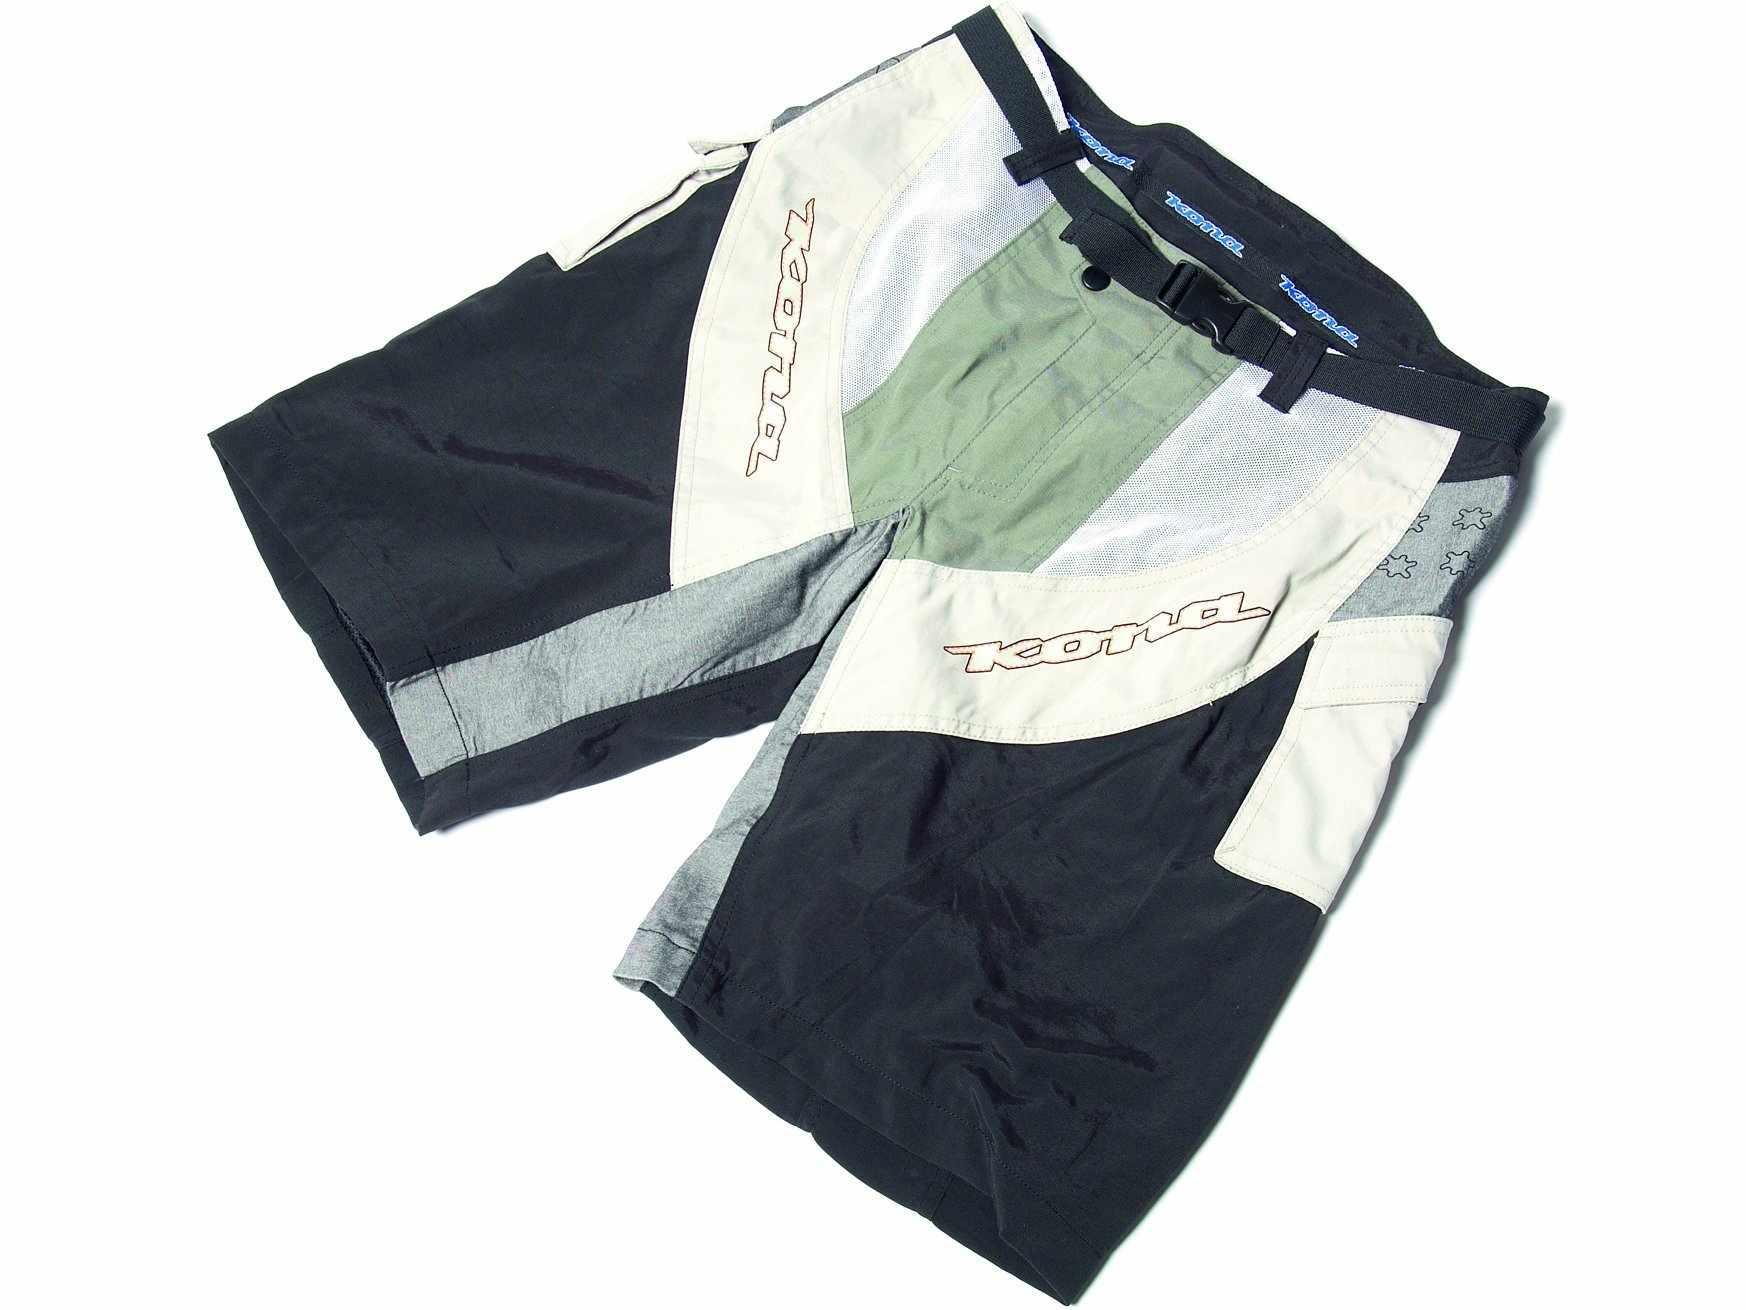 Kona Supreme Cargo Shorts